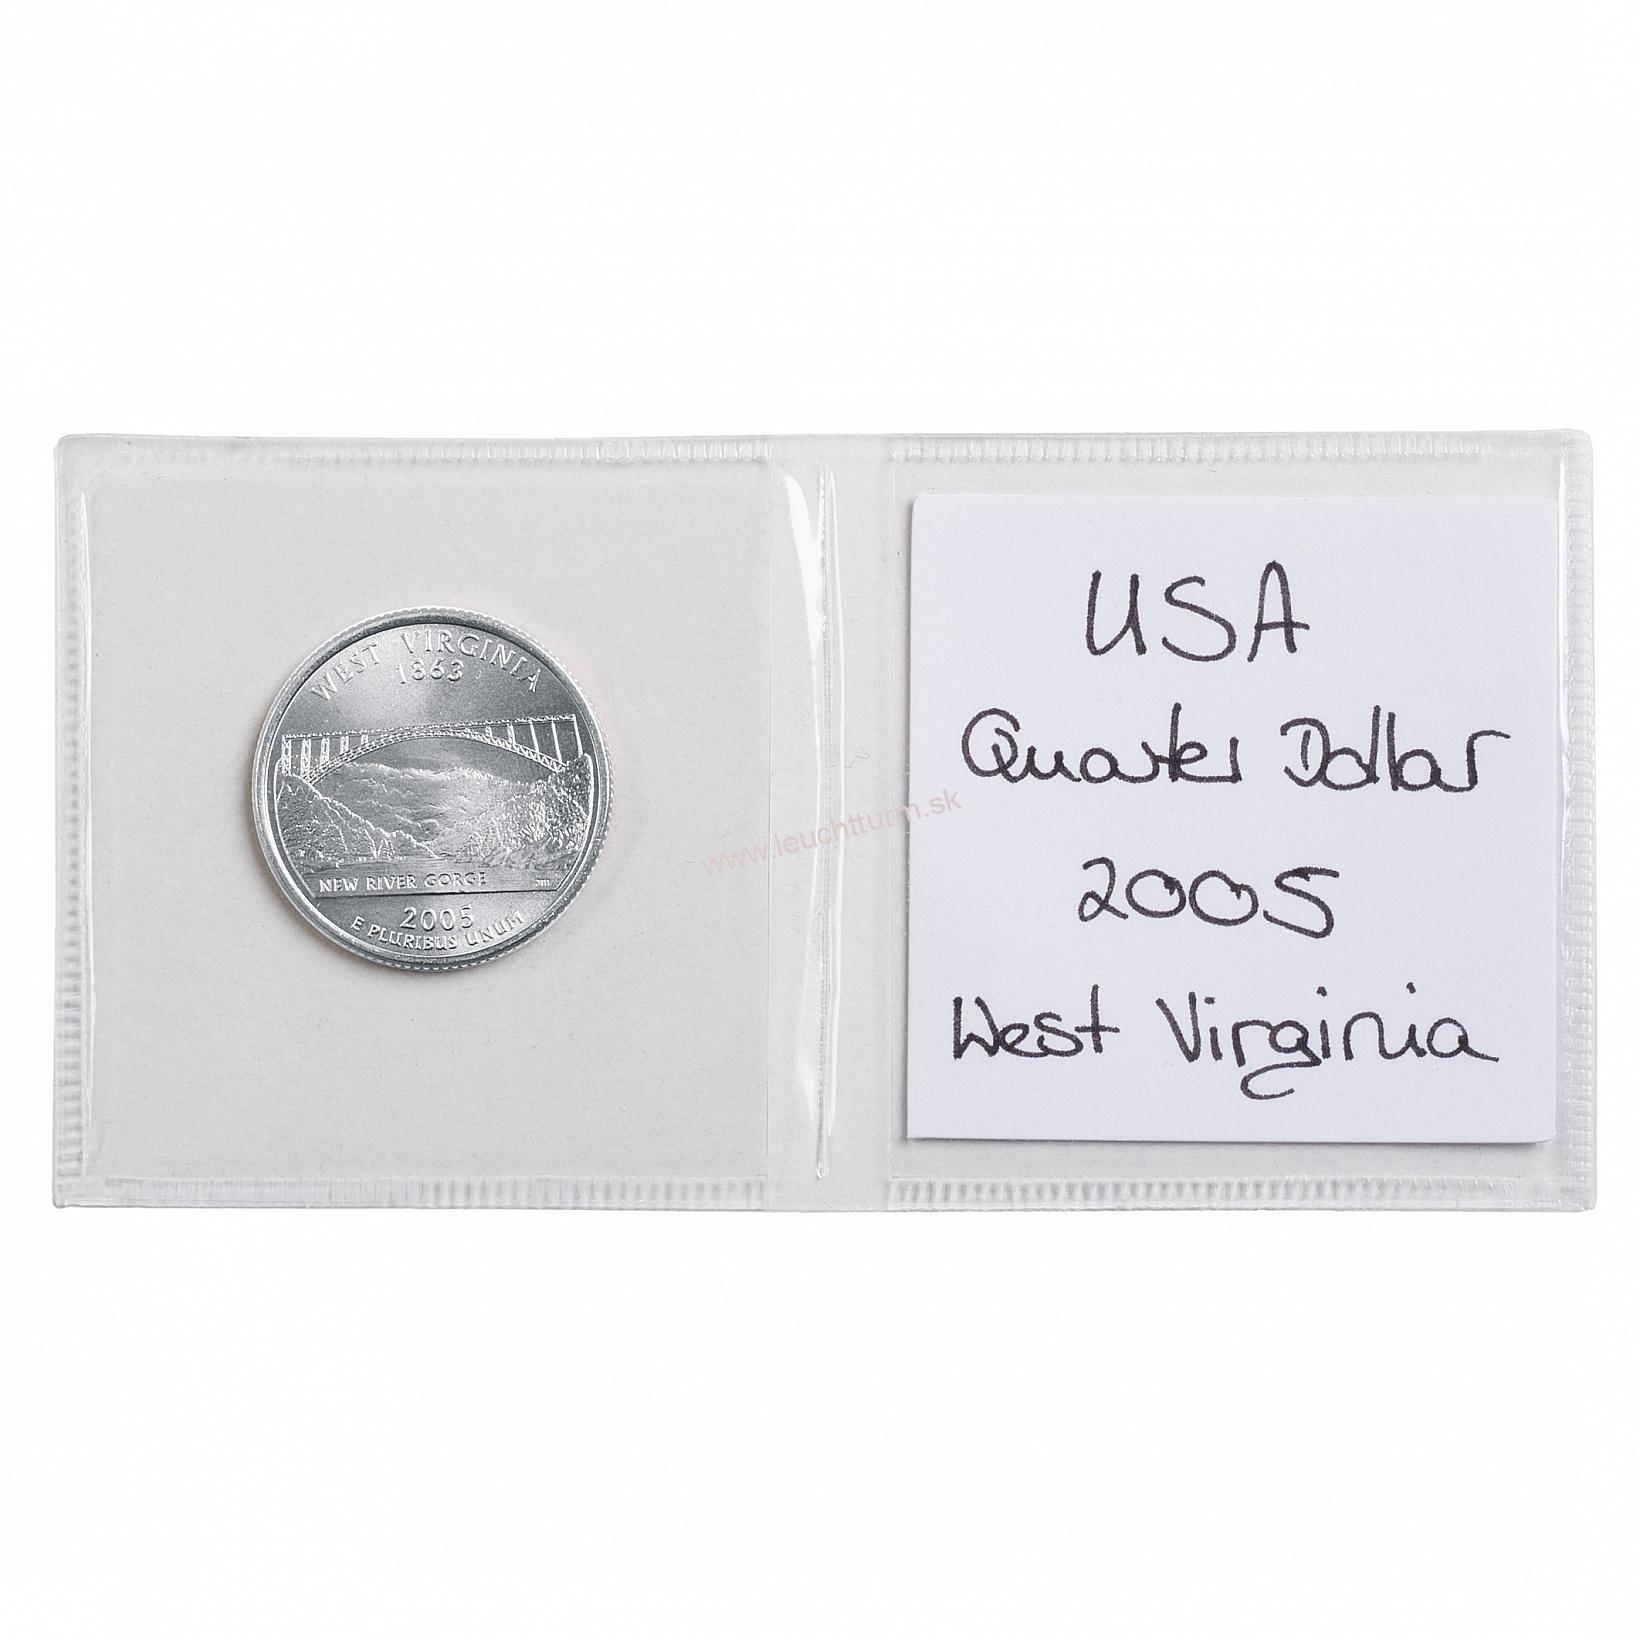 PVC puzdro na mincu c2474e22e85